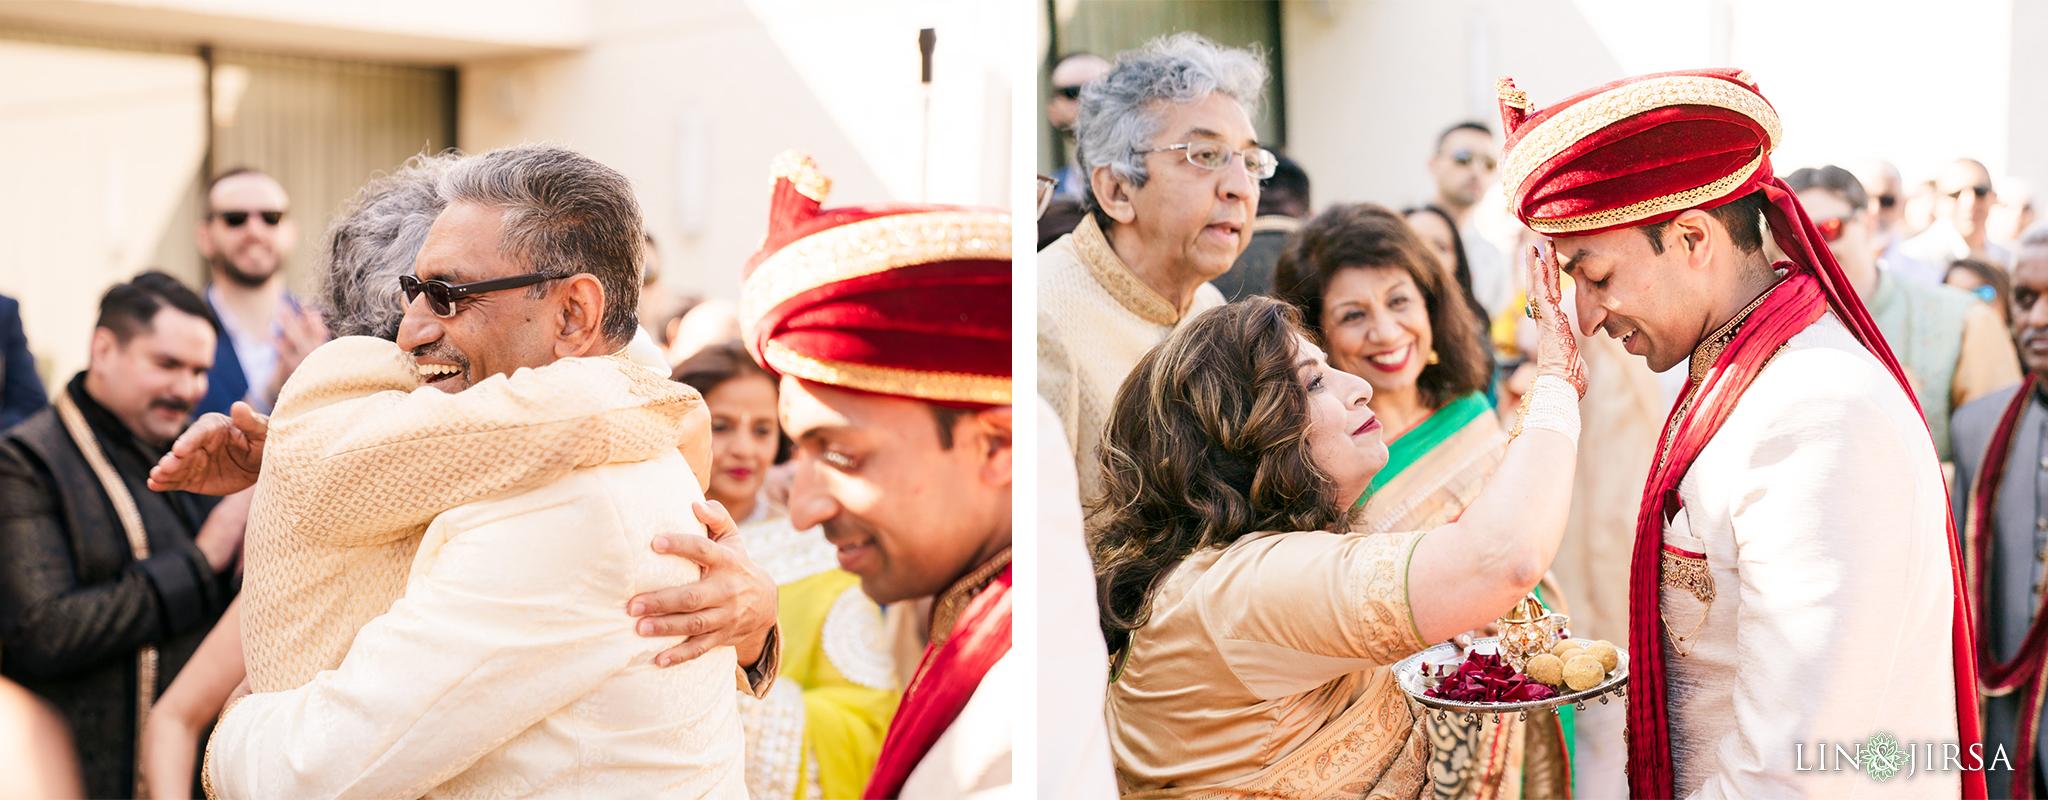 09 Newport Beach Marriott Indian Wedding Photography